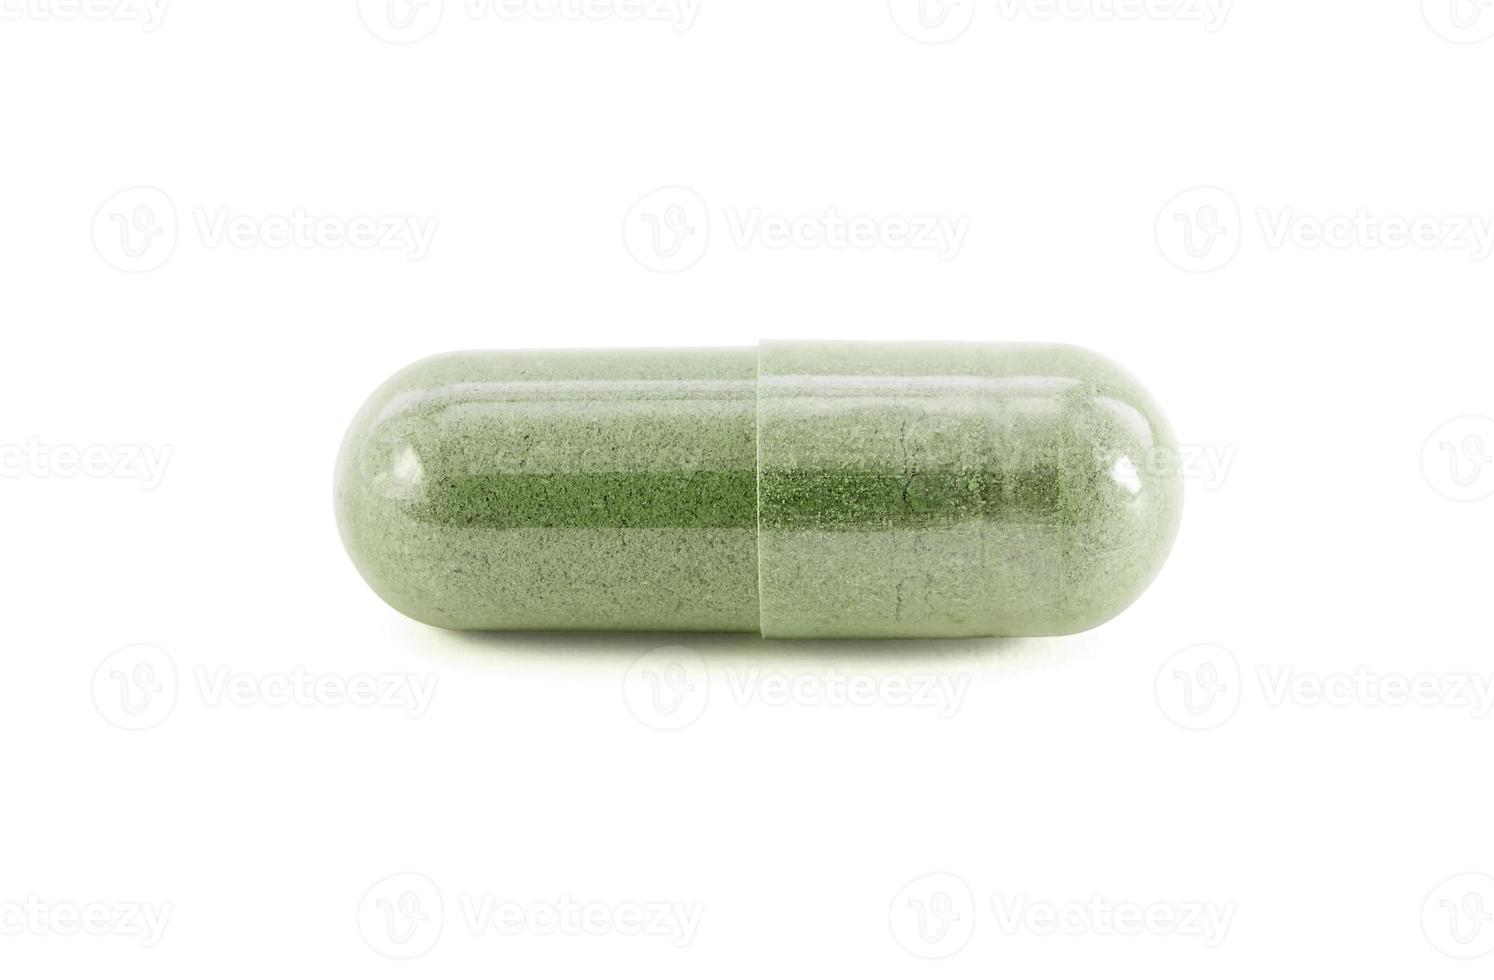 cápsula de suplemento a base de hierbas verde aislado en blanco foto